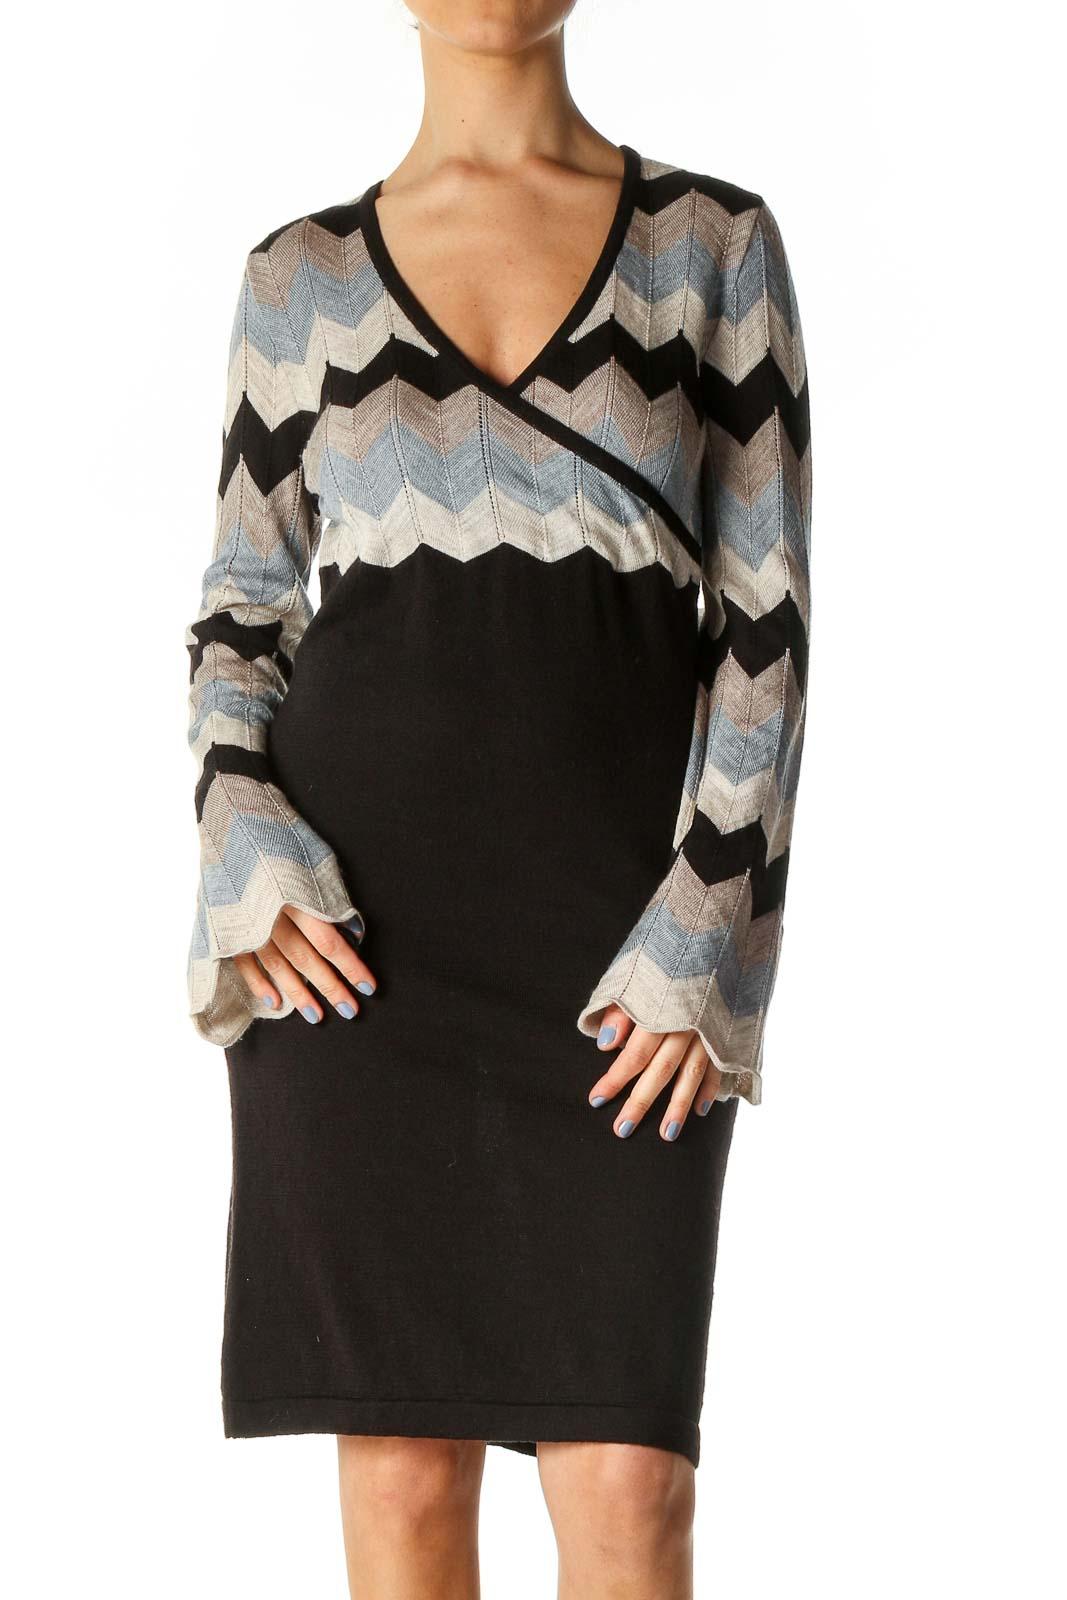 Black Textured Sheath Dress Front